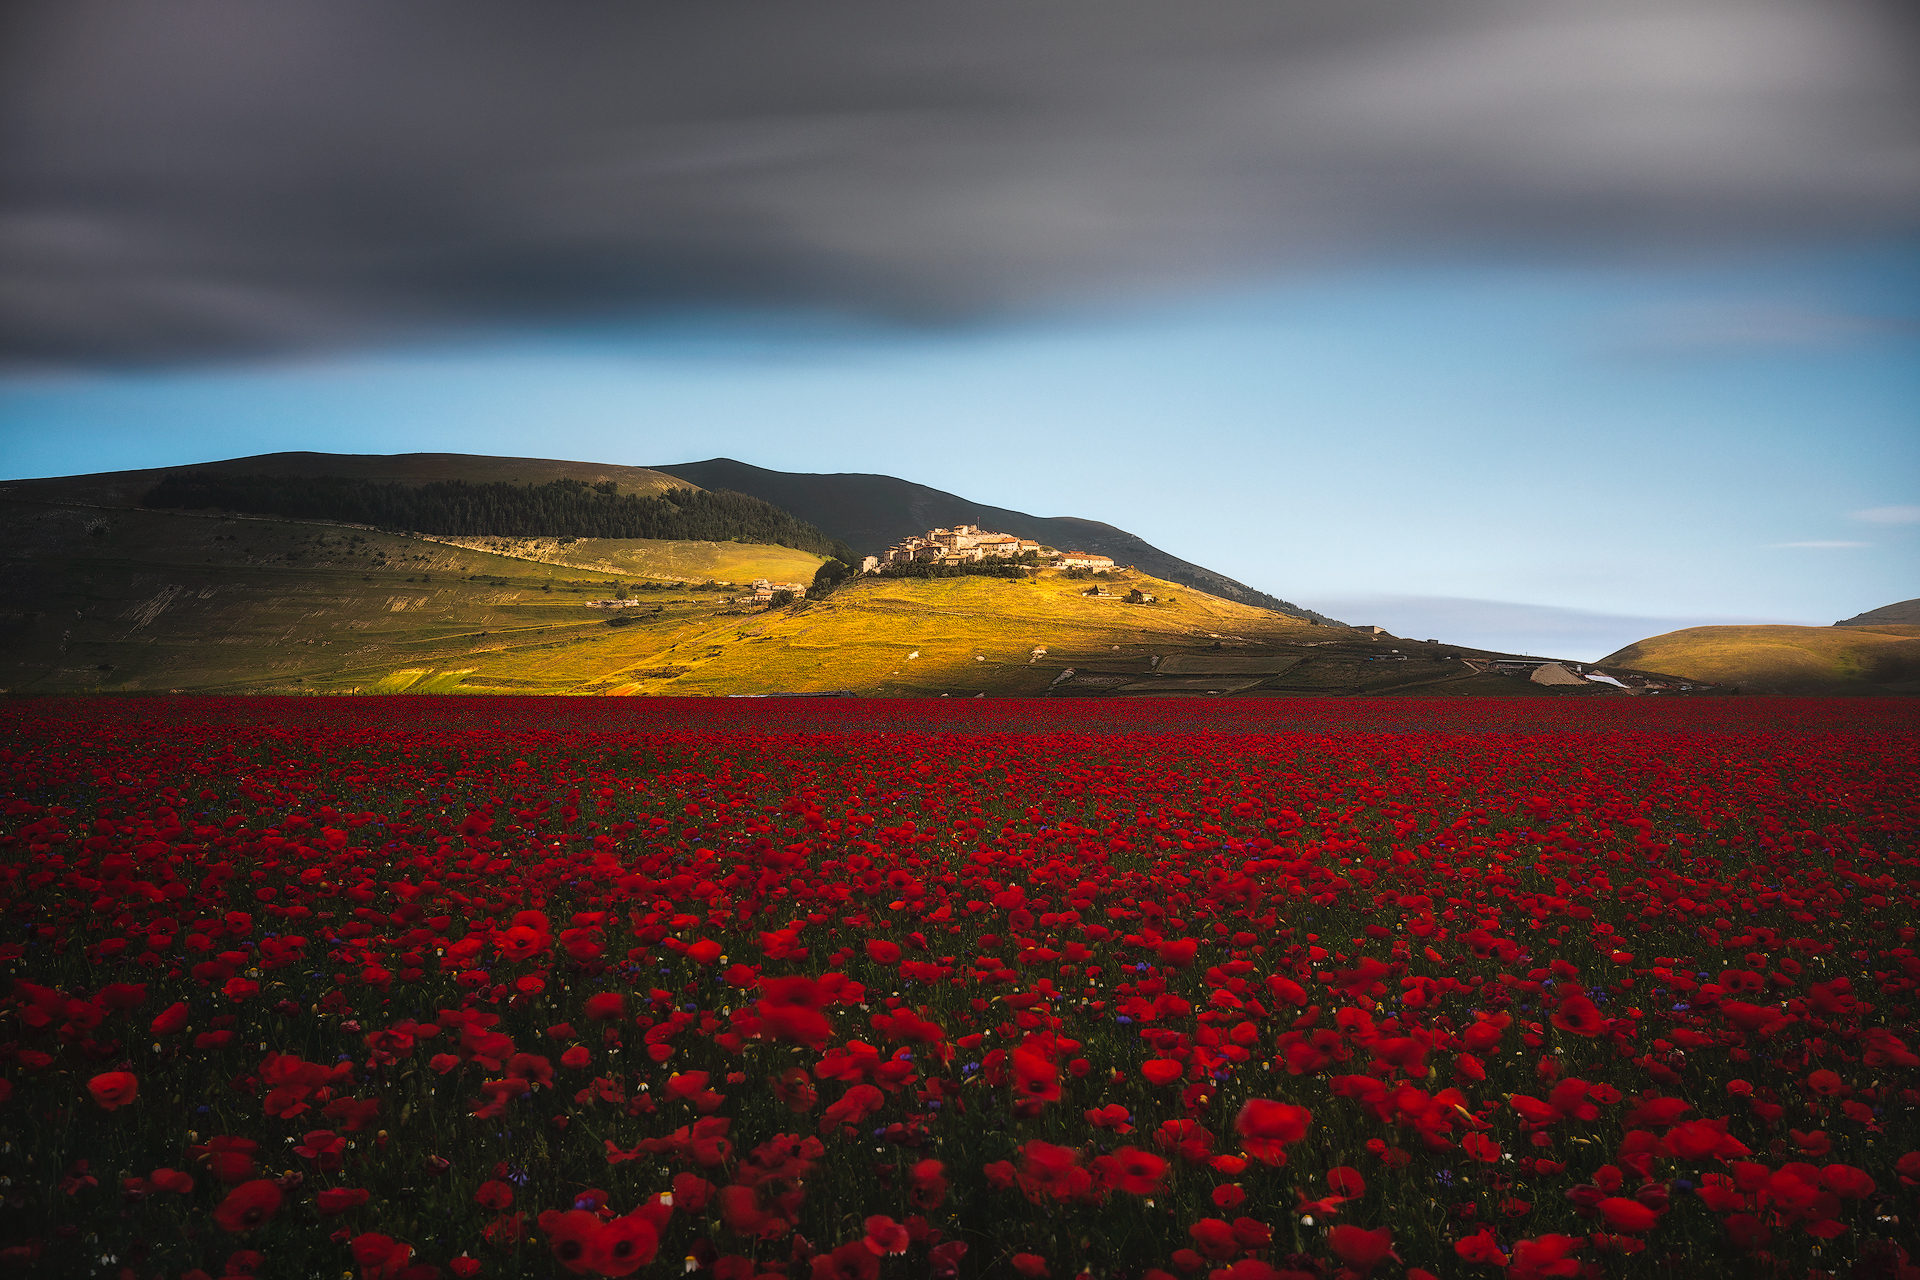 Red Carpet...